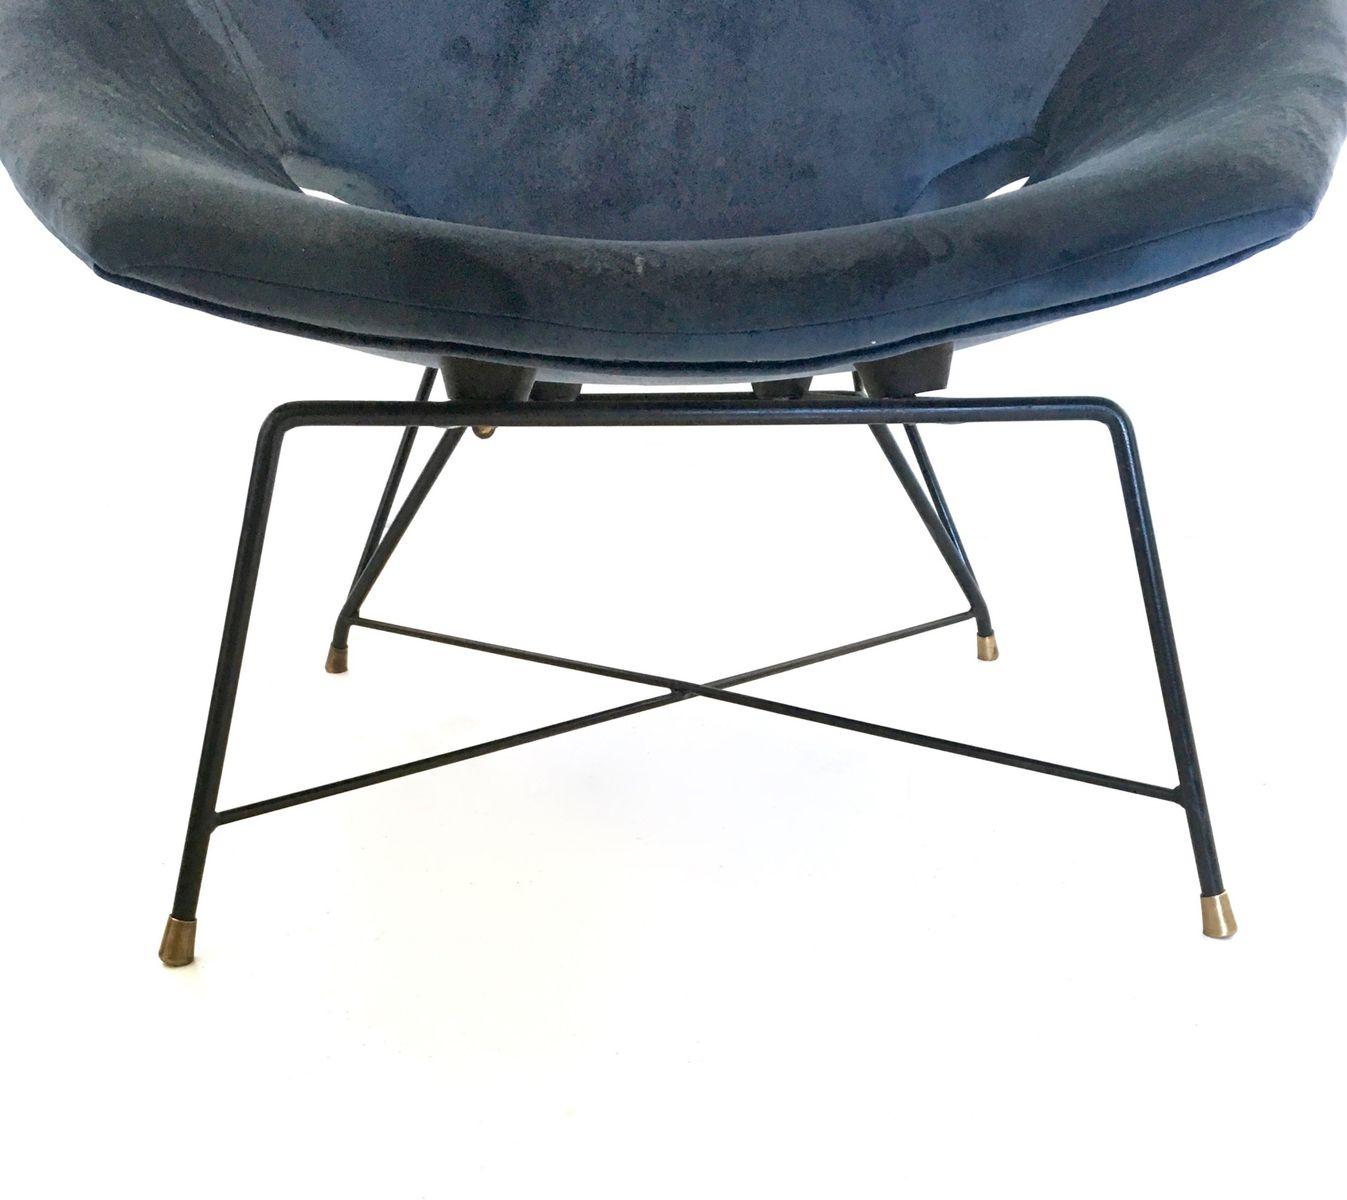 blaue samt polsterst hle von augusto bozzi f r saporiti. Black Bedroom Furniture Sets. Home Design Ideas